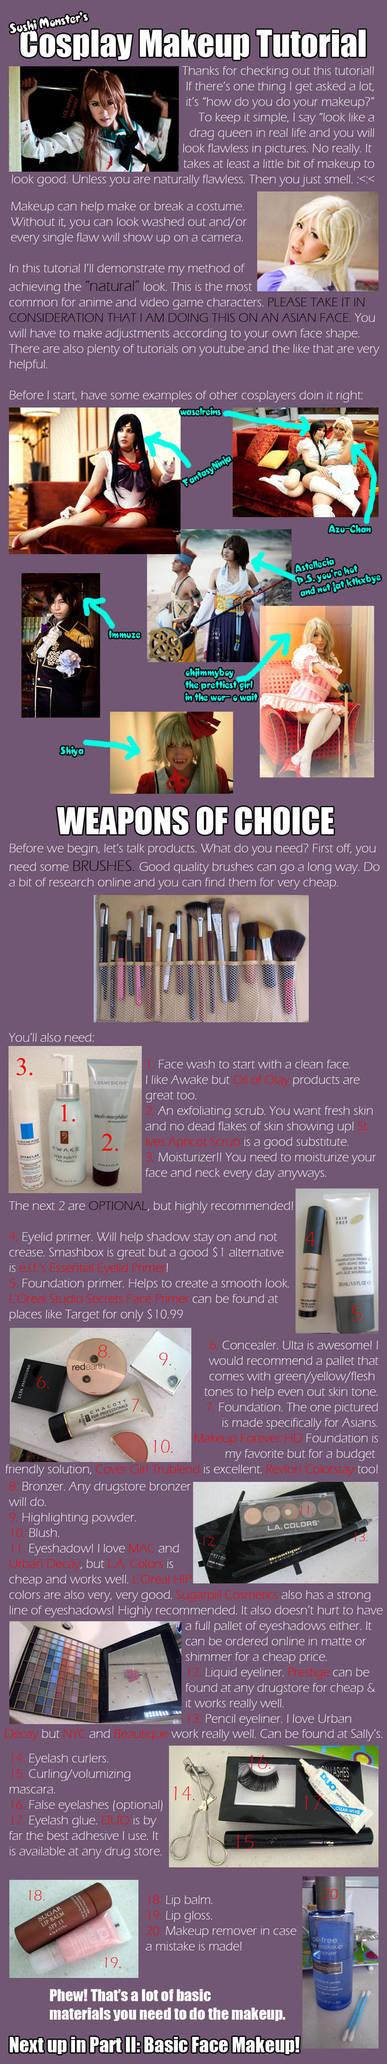 Cosplay Makeup Tutorial Part I